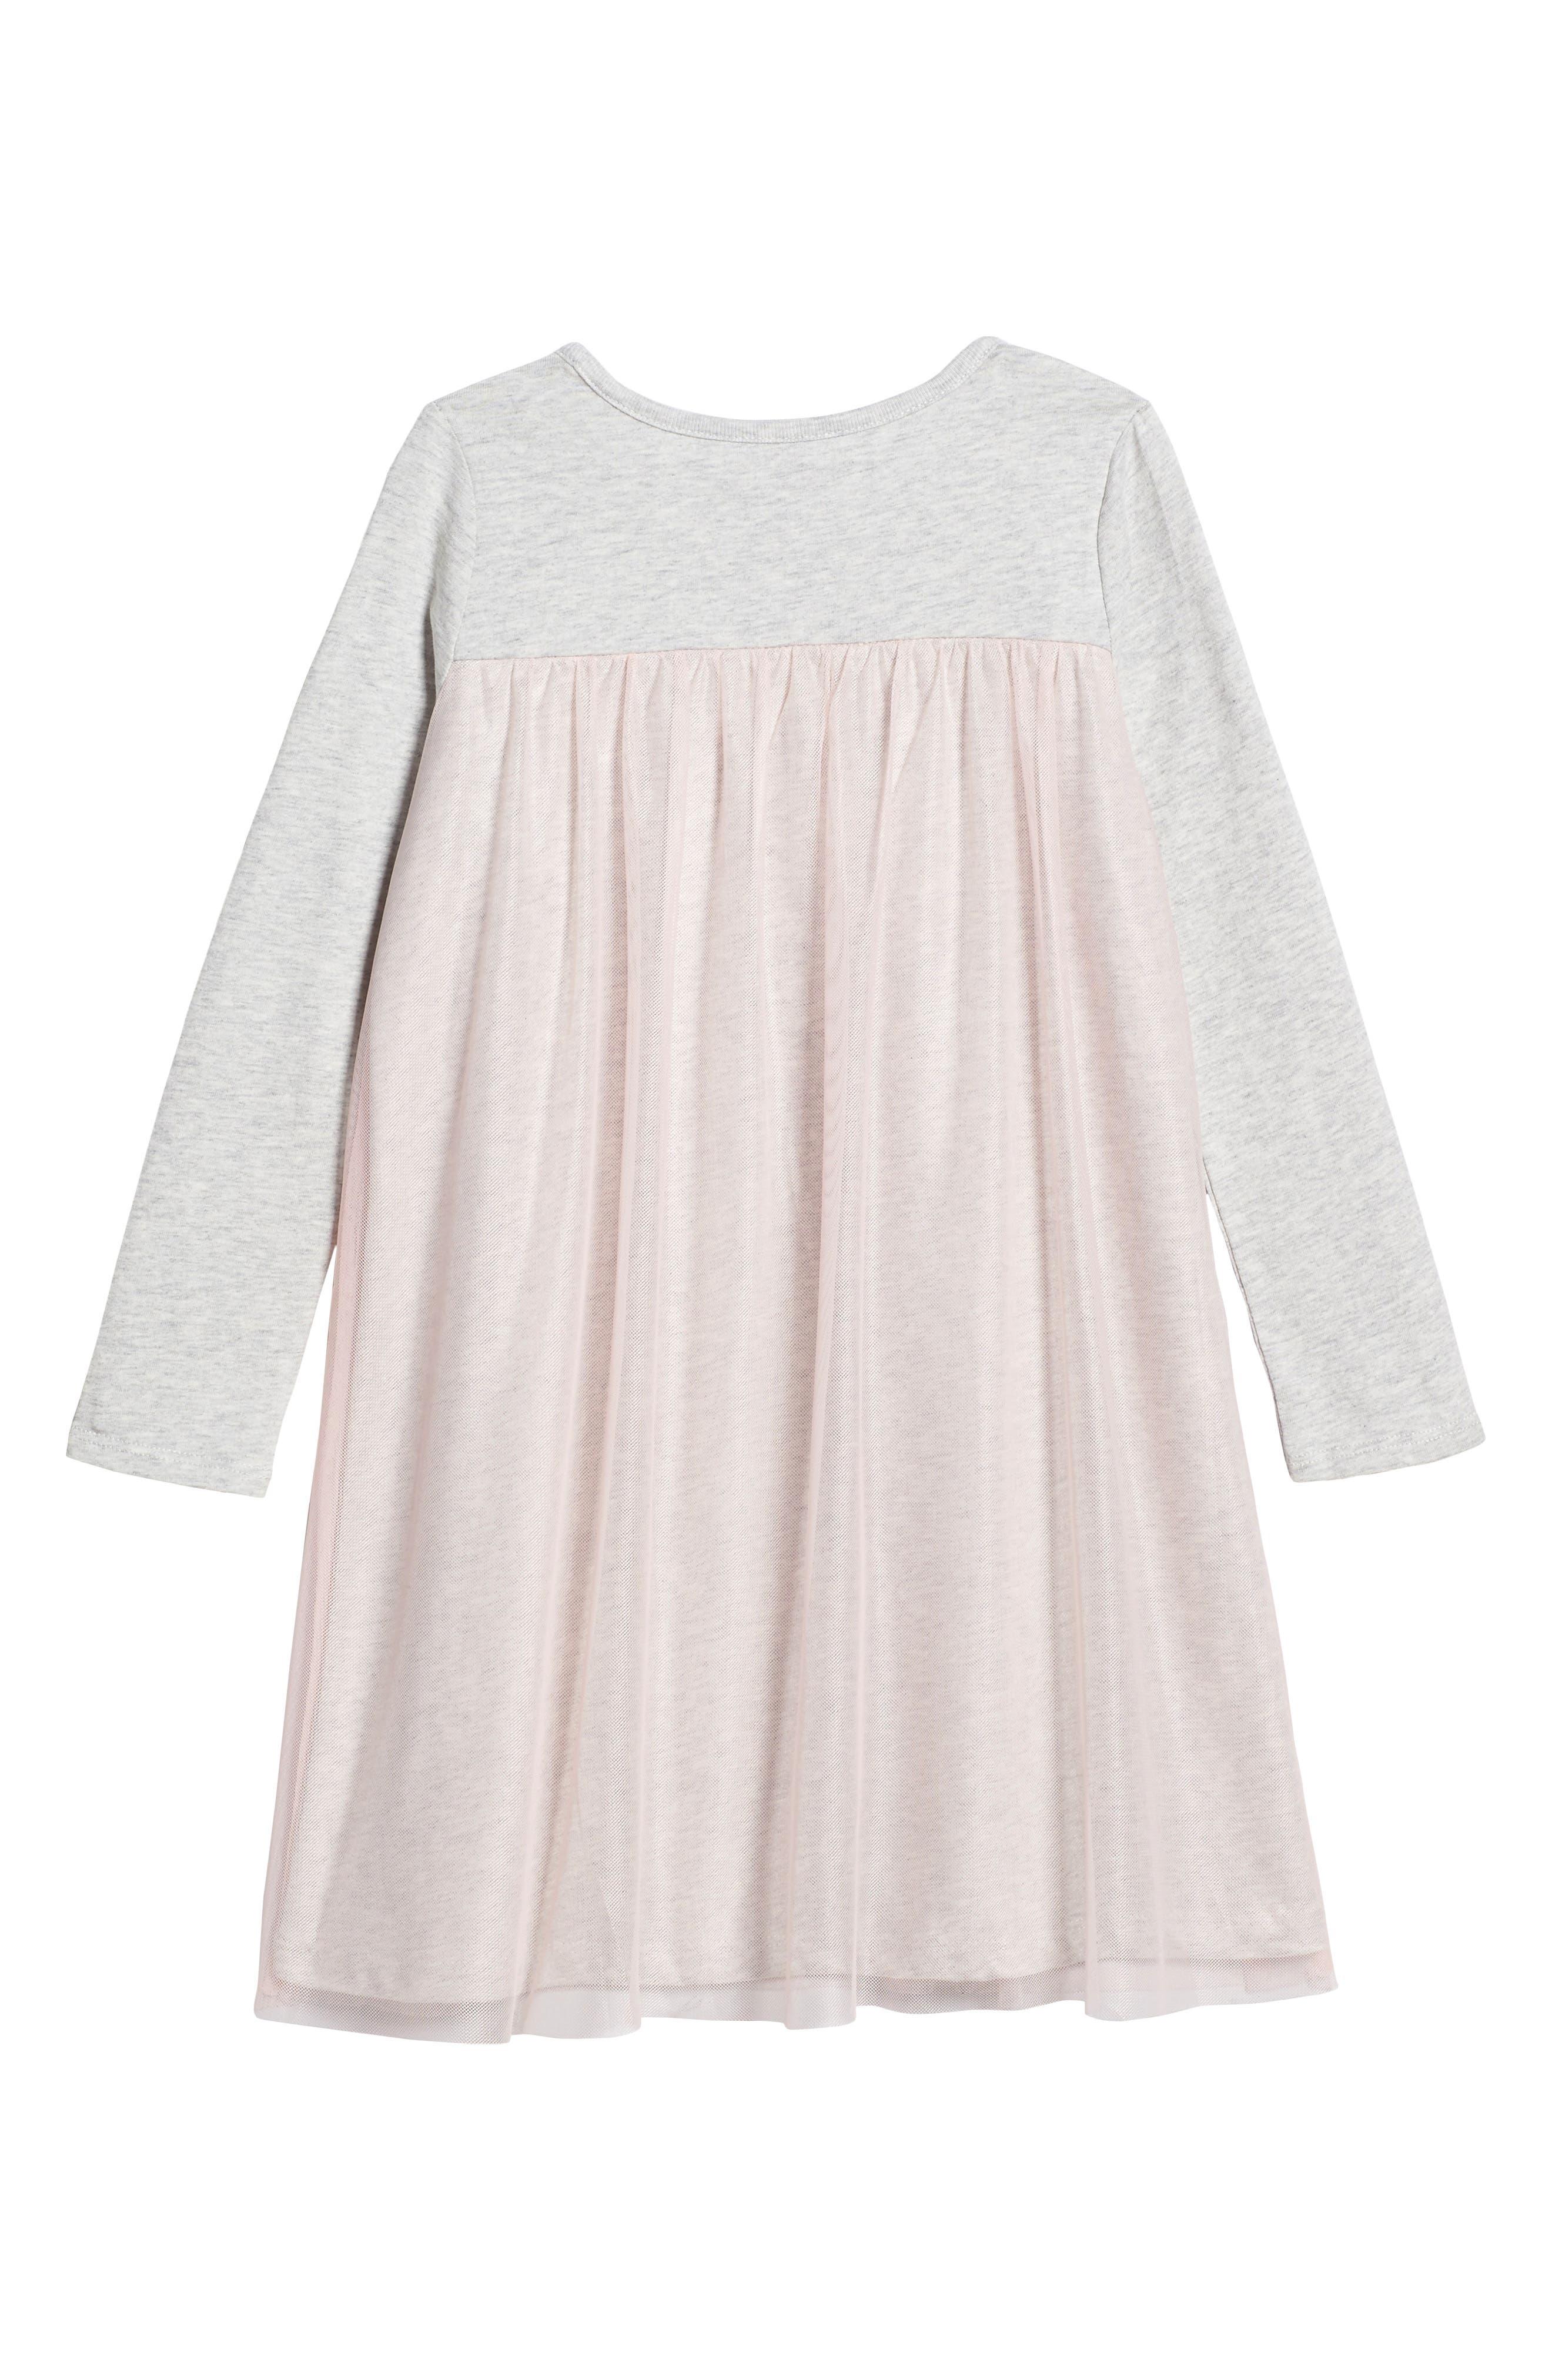 Mackenzie Tulle Dress,                             Alternate thumbnail 2, color,                             Soft Peach